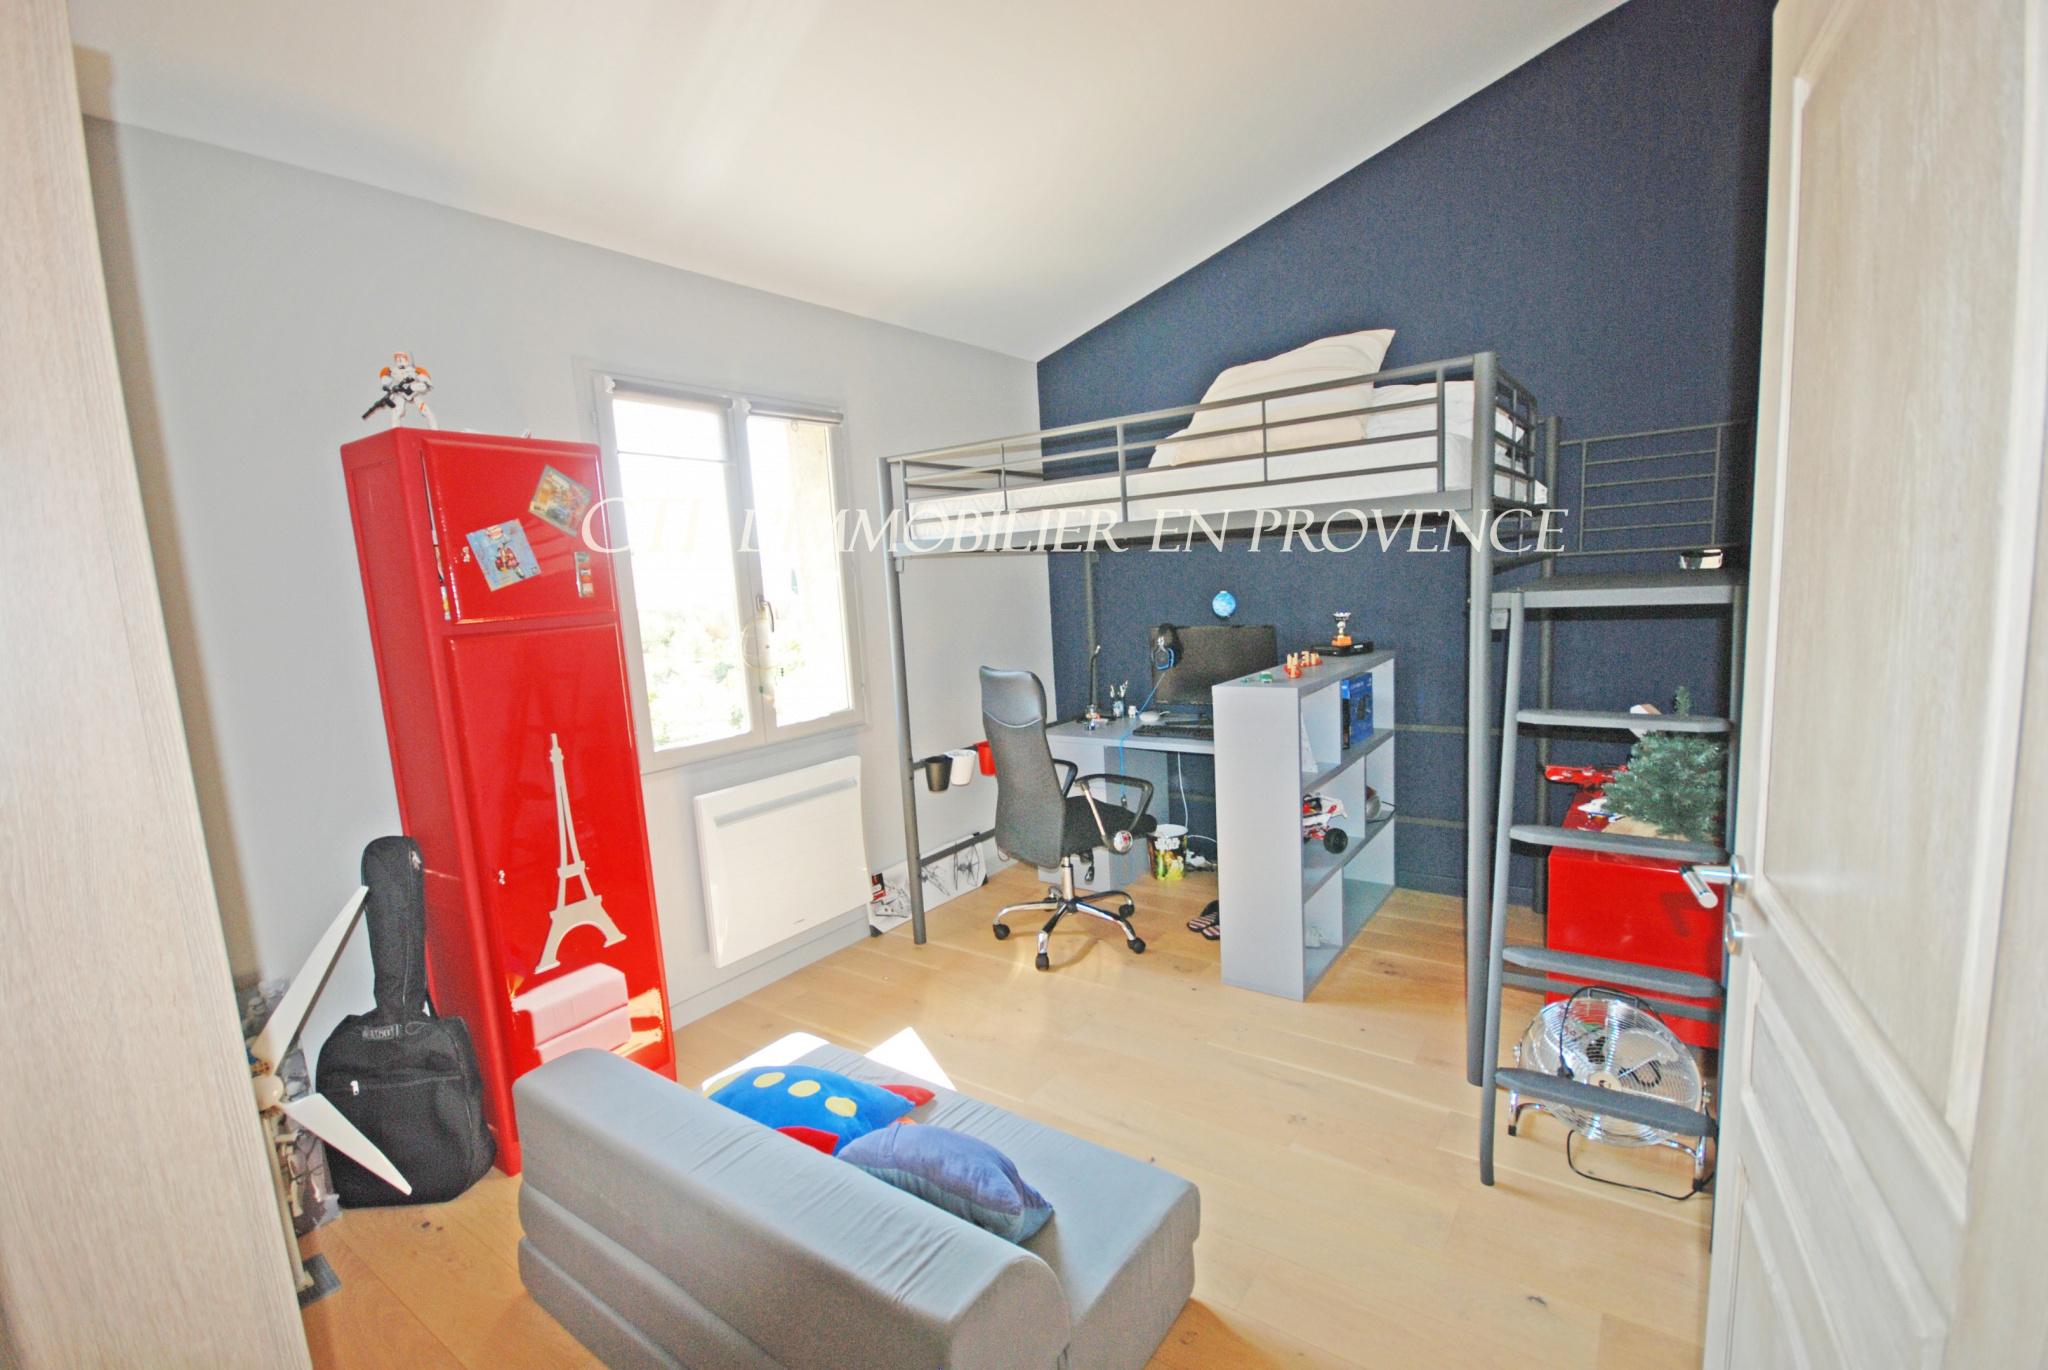 0 www.cti-provence.net Vente grande bastide en 2 habitations garage, grand terrain, 5 mn de vaison